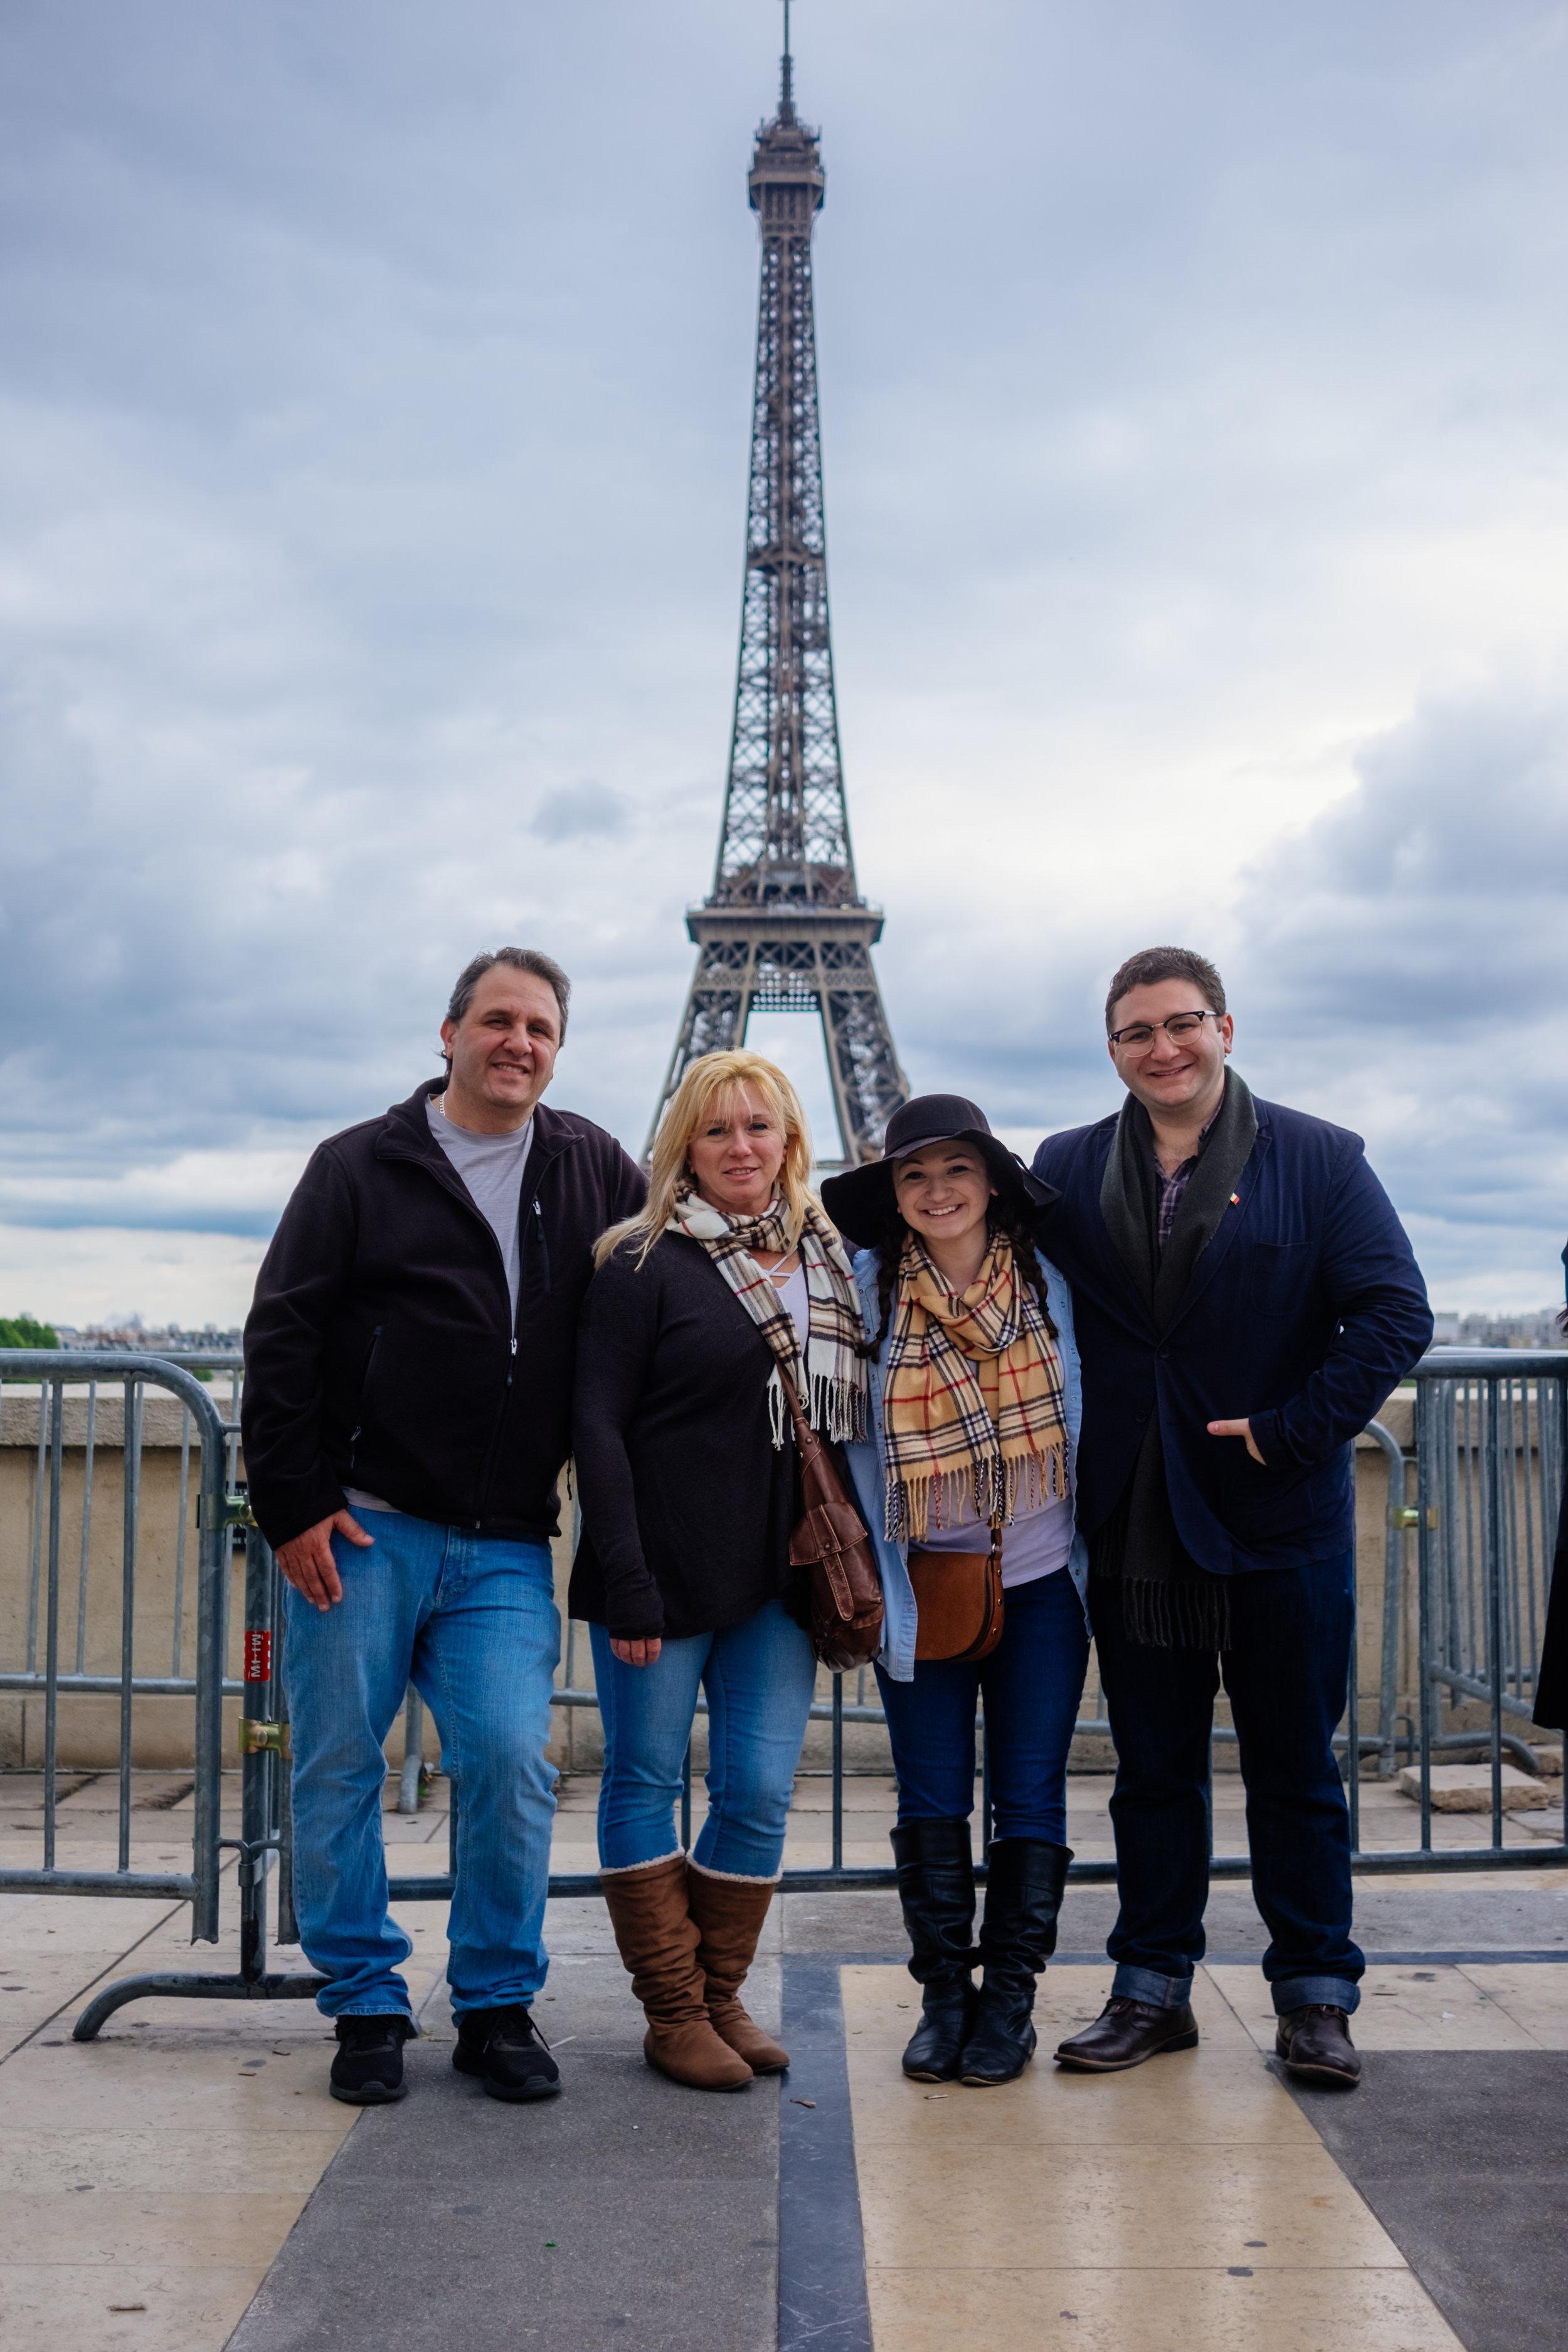 Catanzariti Eiffel